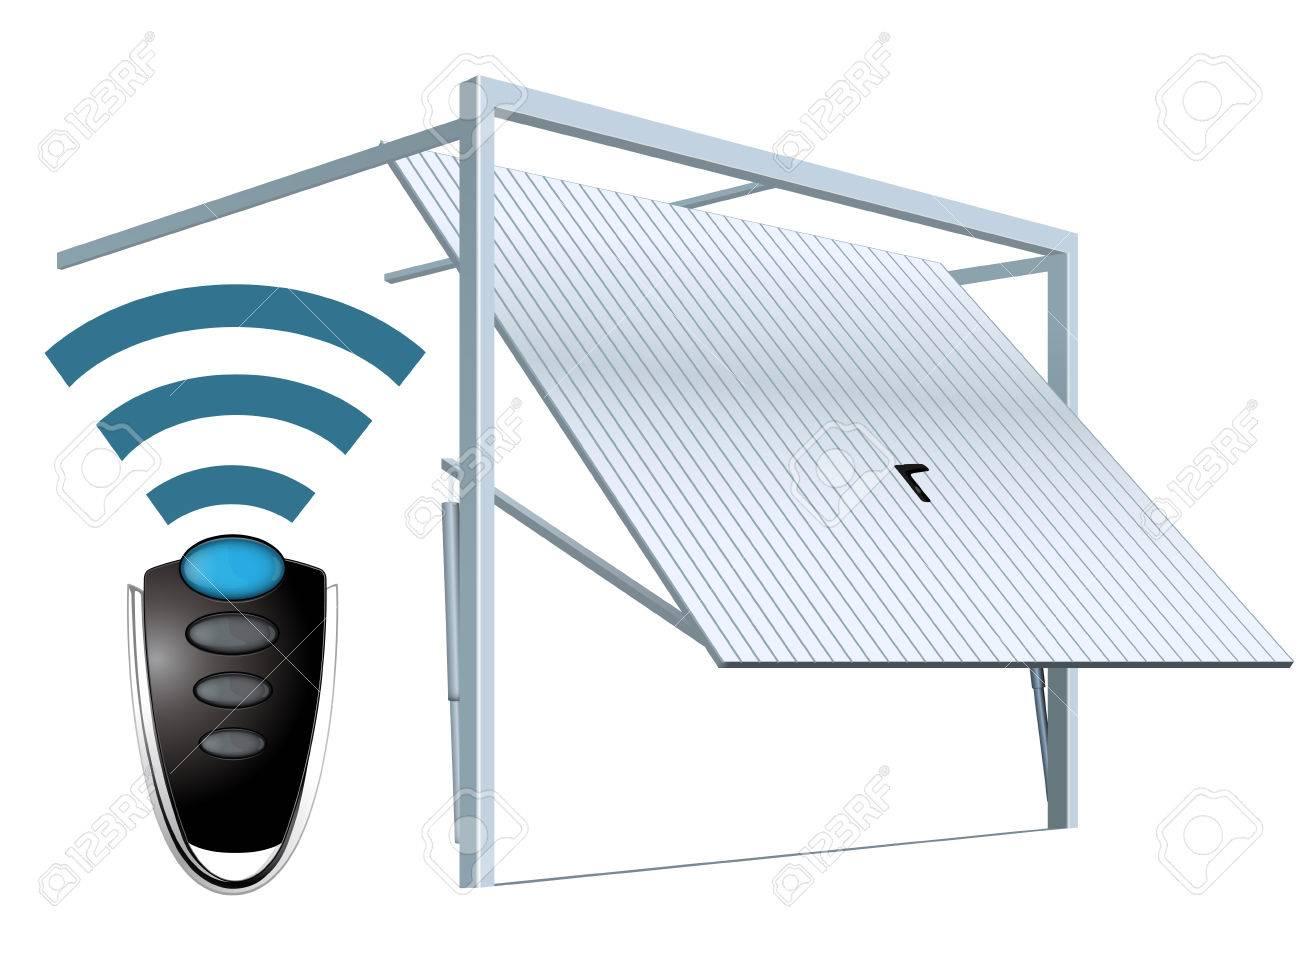 Automatic wireless garage door system - remote open - 77406546